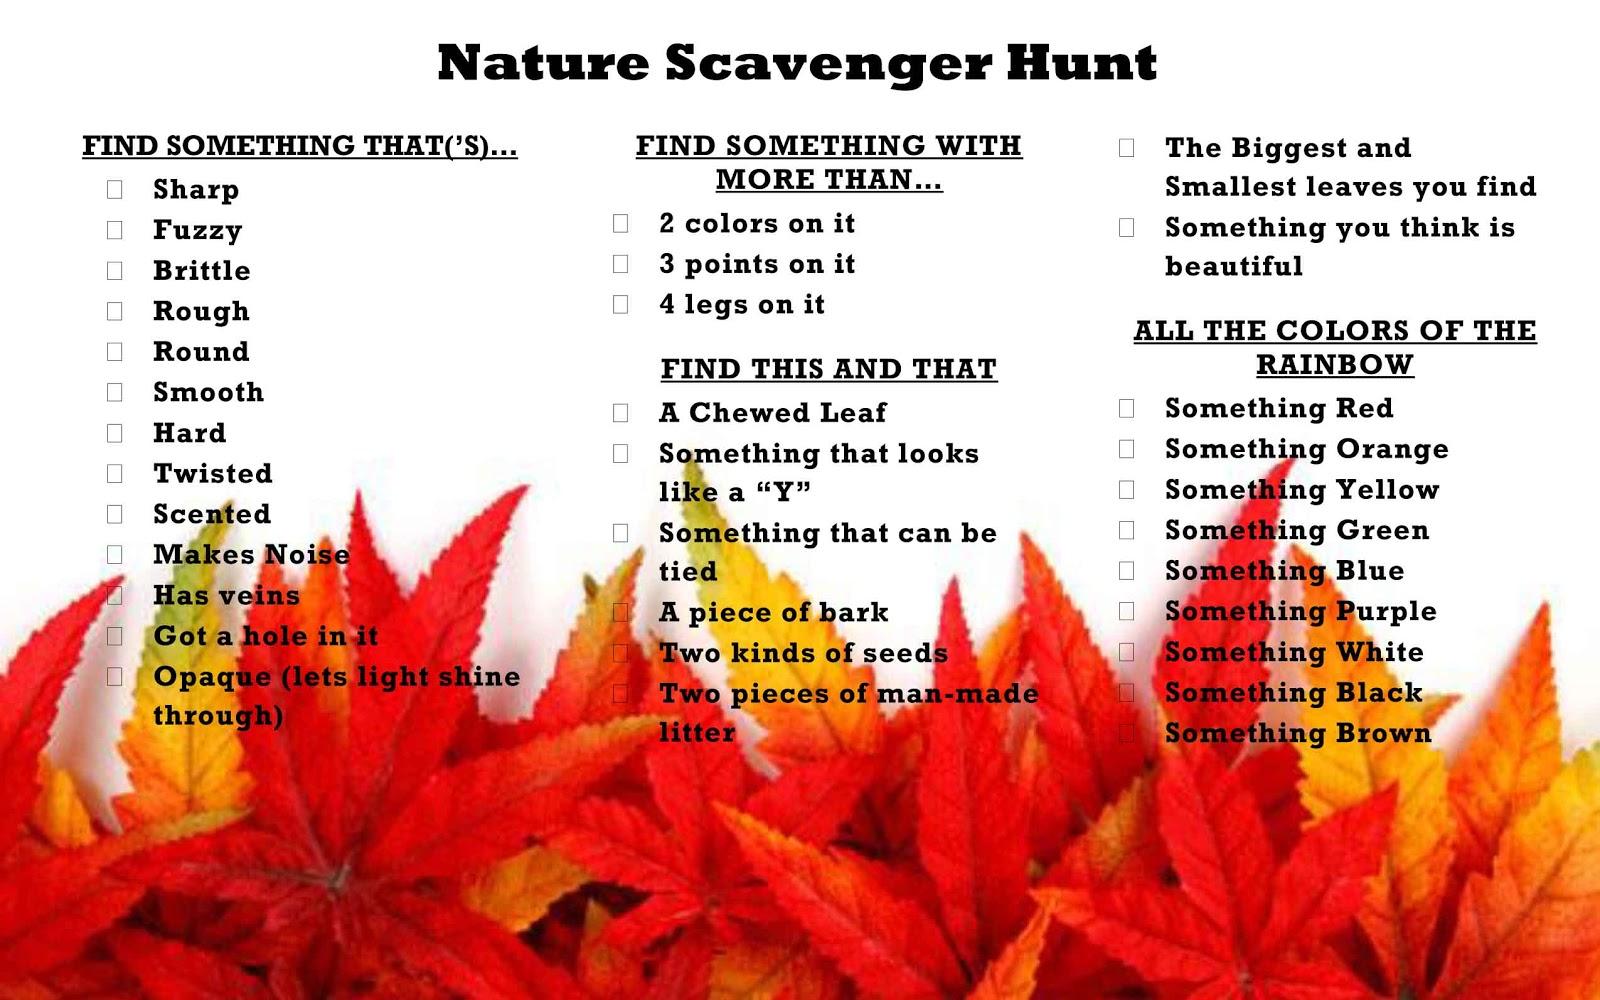 Backyard Nature Scavenger Hunt : We used these Scavenger Hunt cards that I put together I laminated